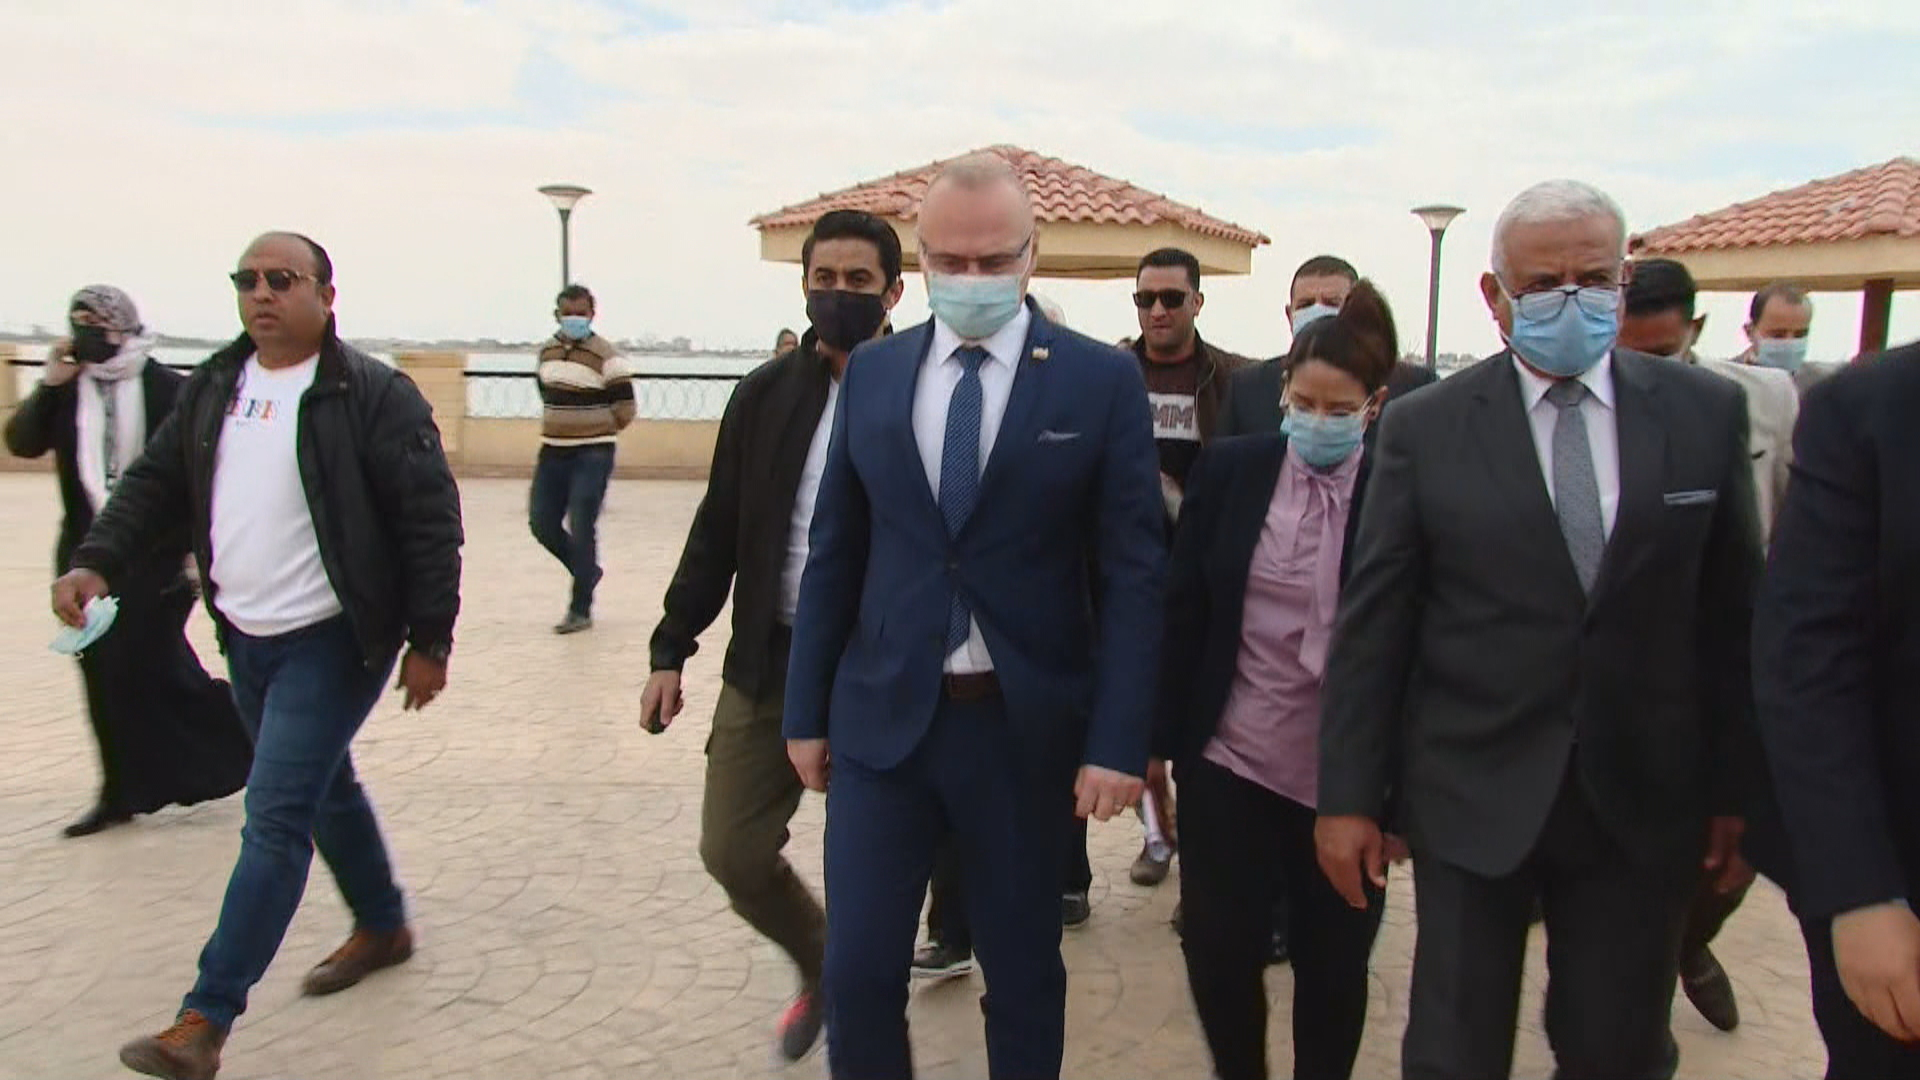 Hrvatska: Ministar Grlić Radman u službenoj poseti Egiptu